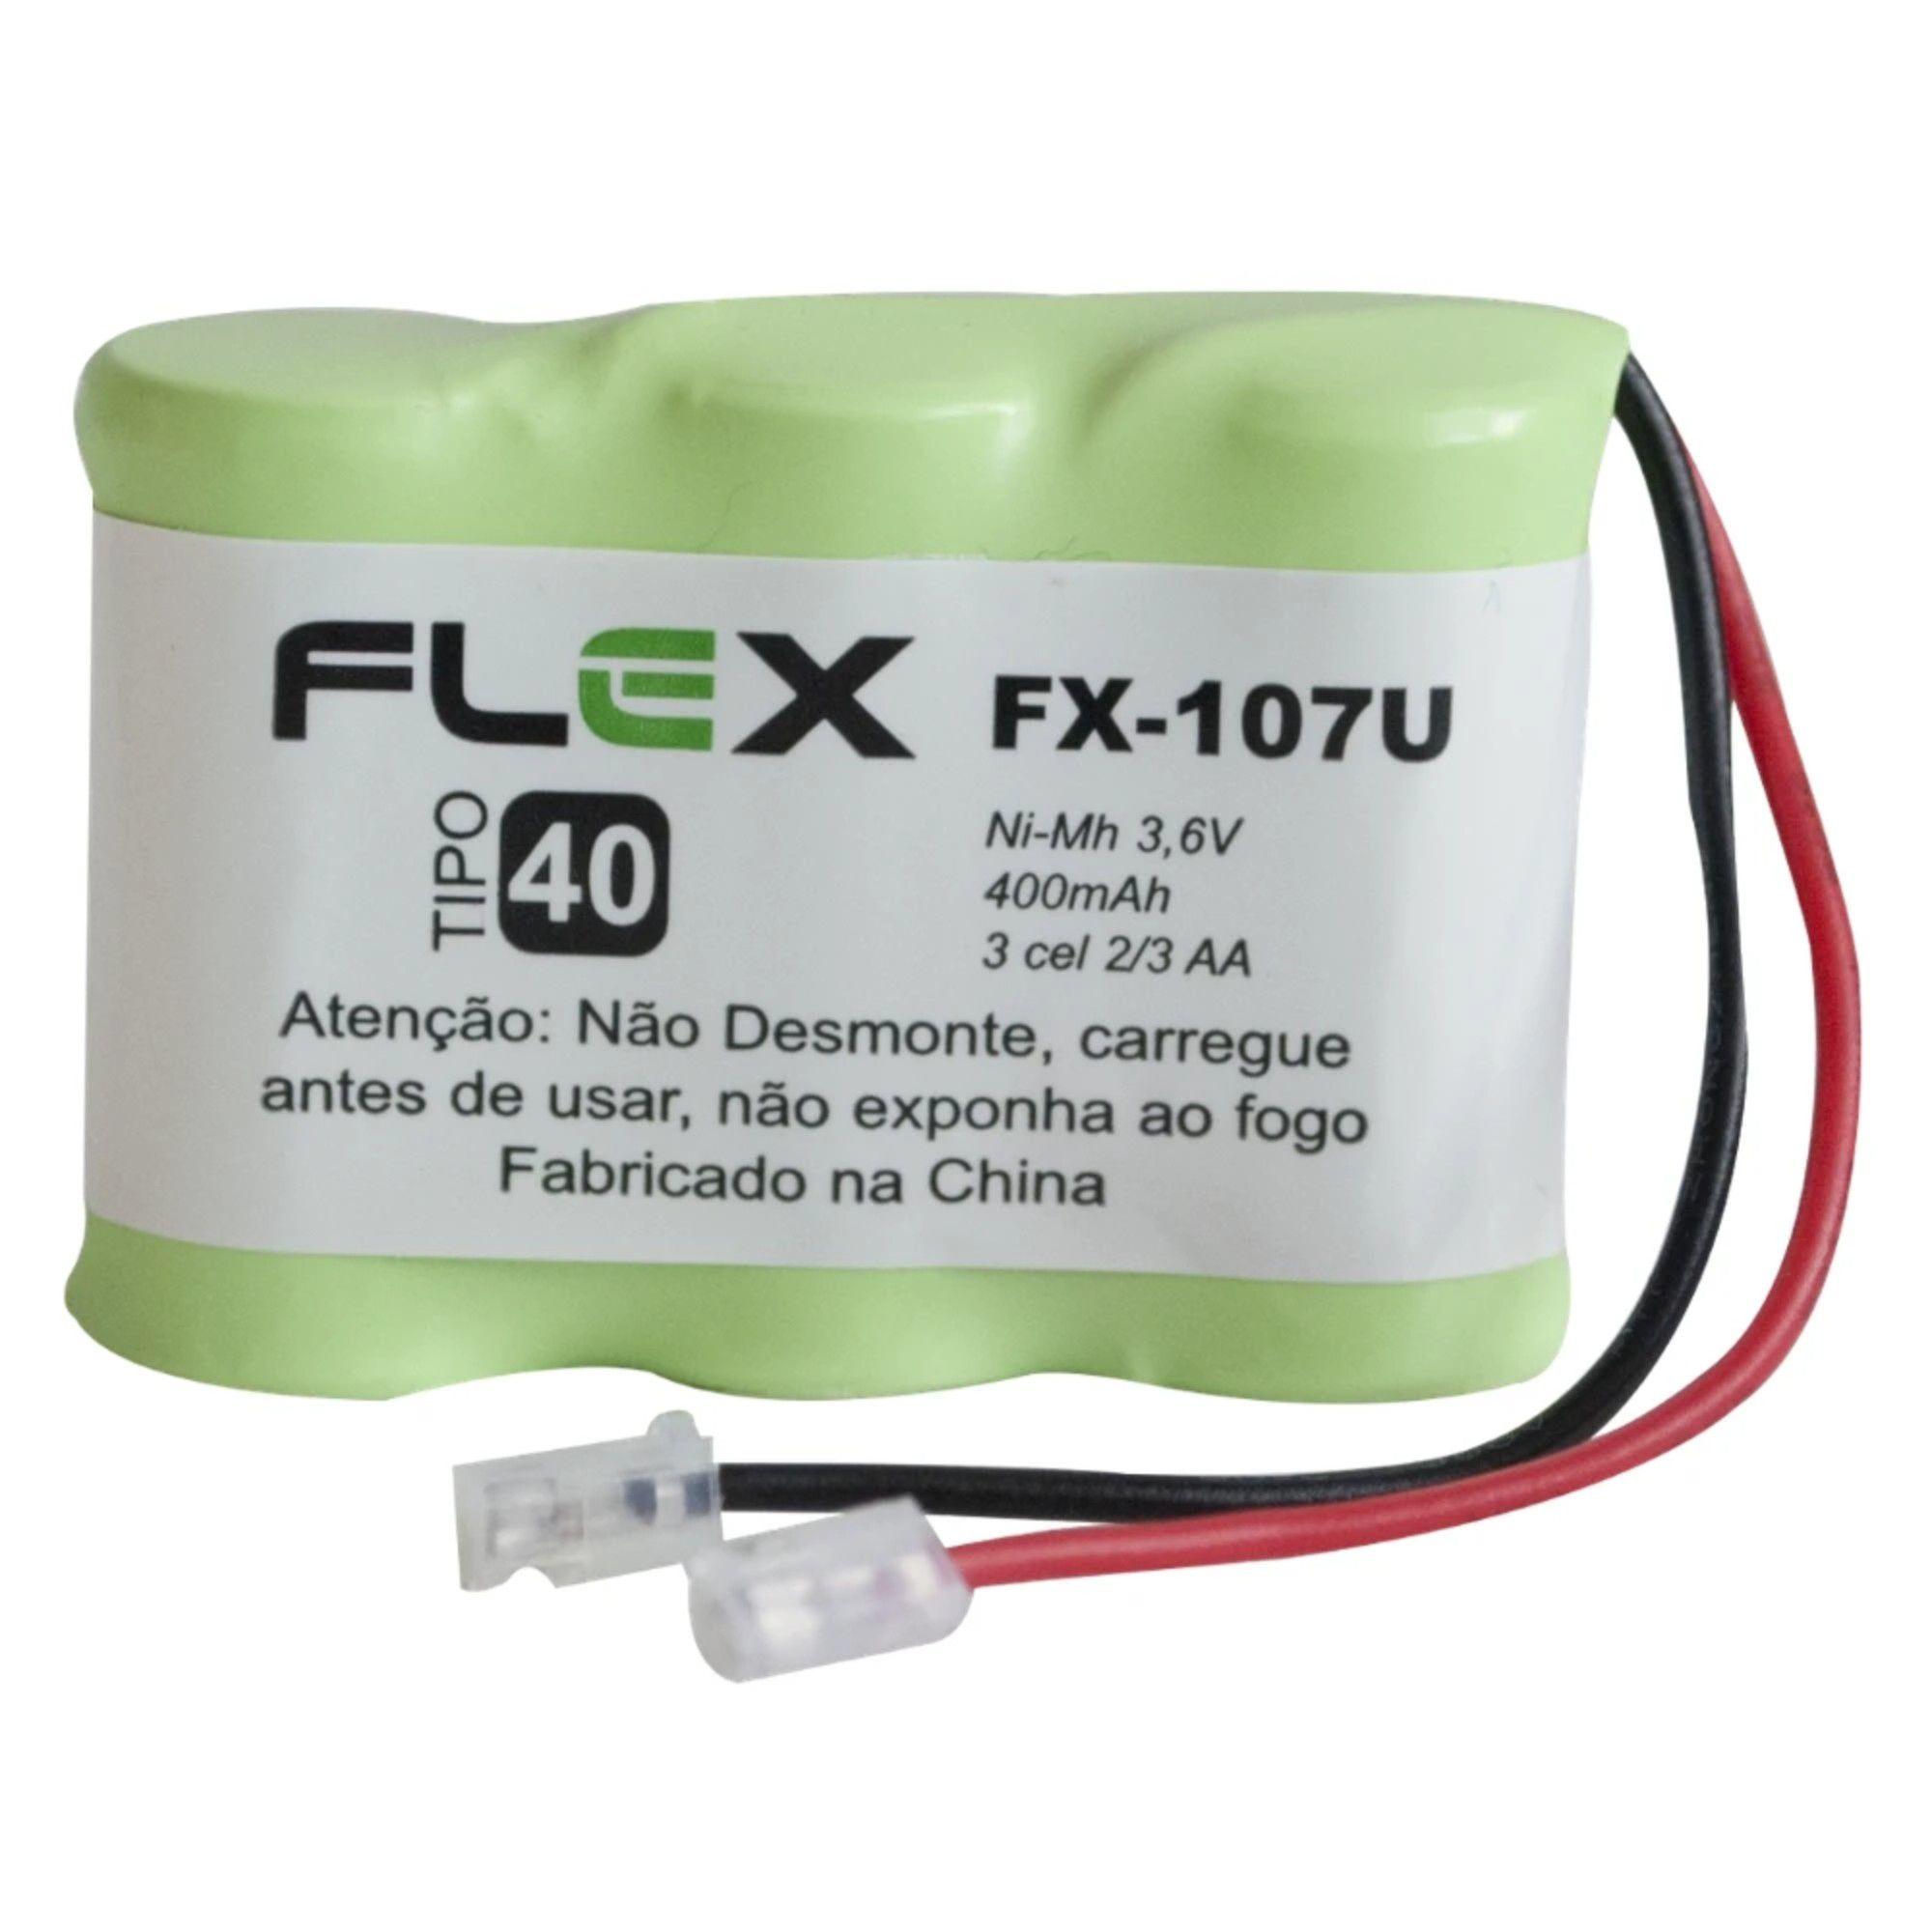 Bateria Telefone Sem Fio Ni-Cd 3.6v 400mah Fx-107u